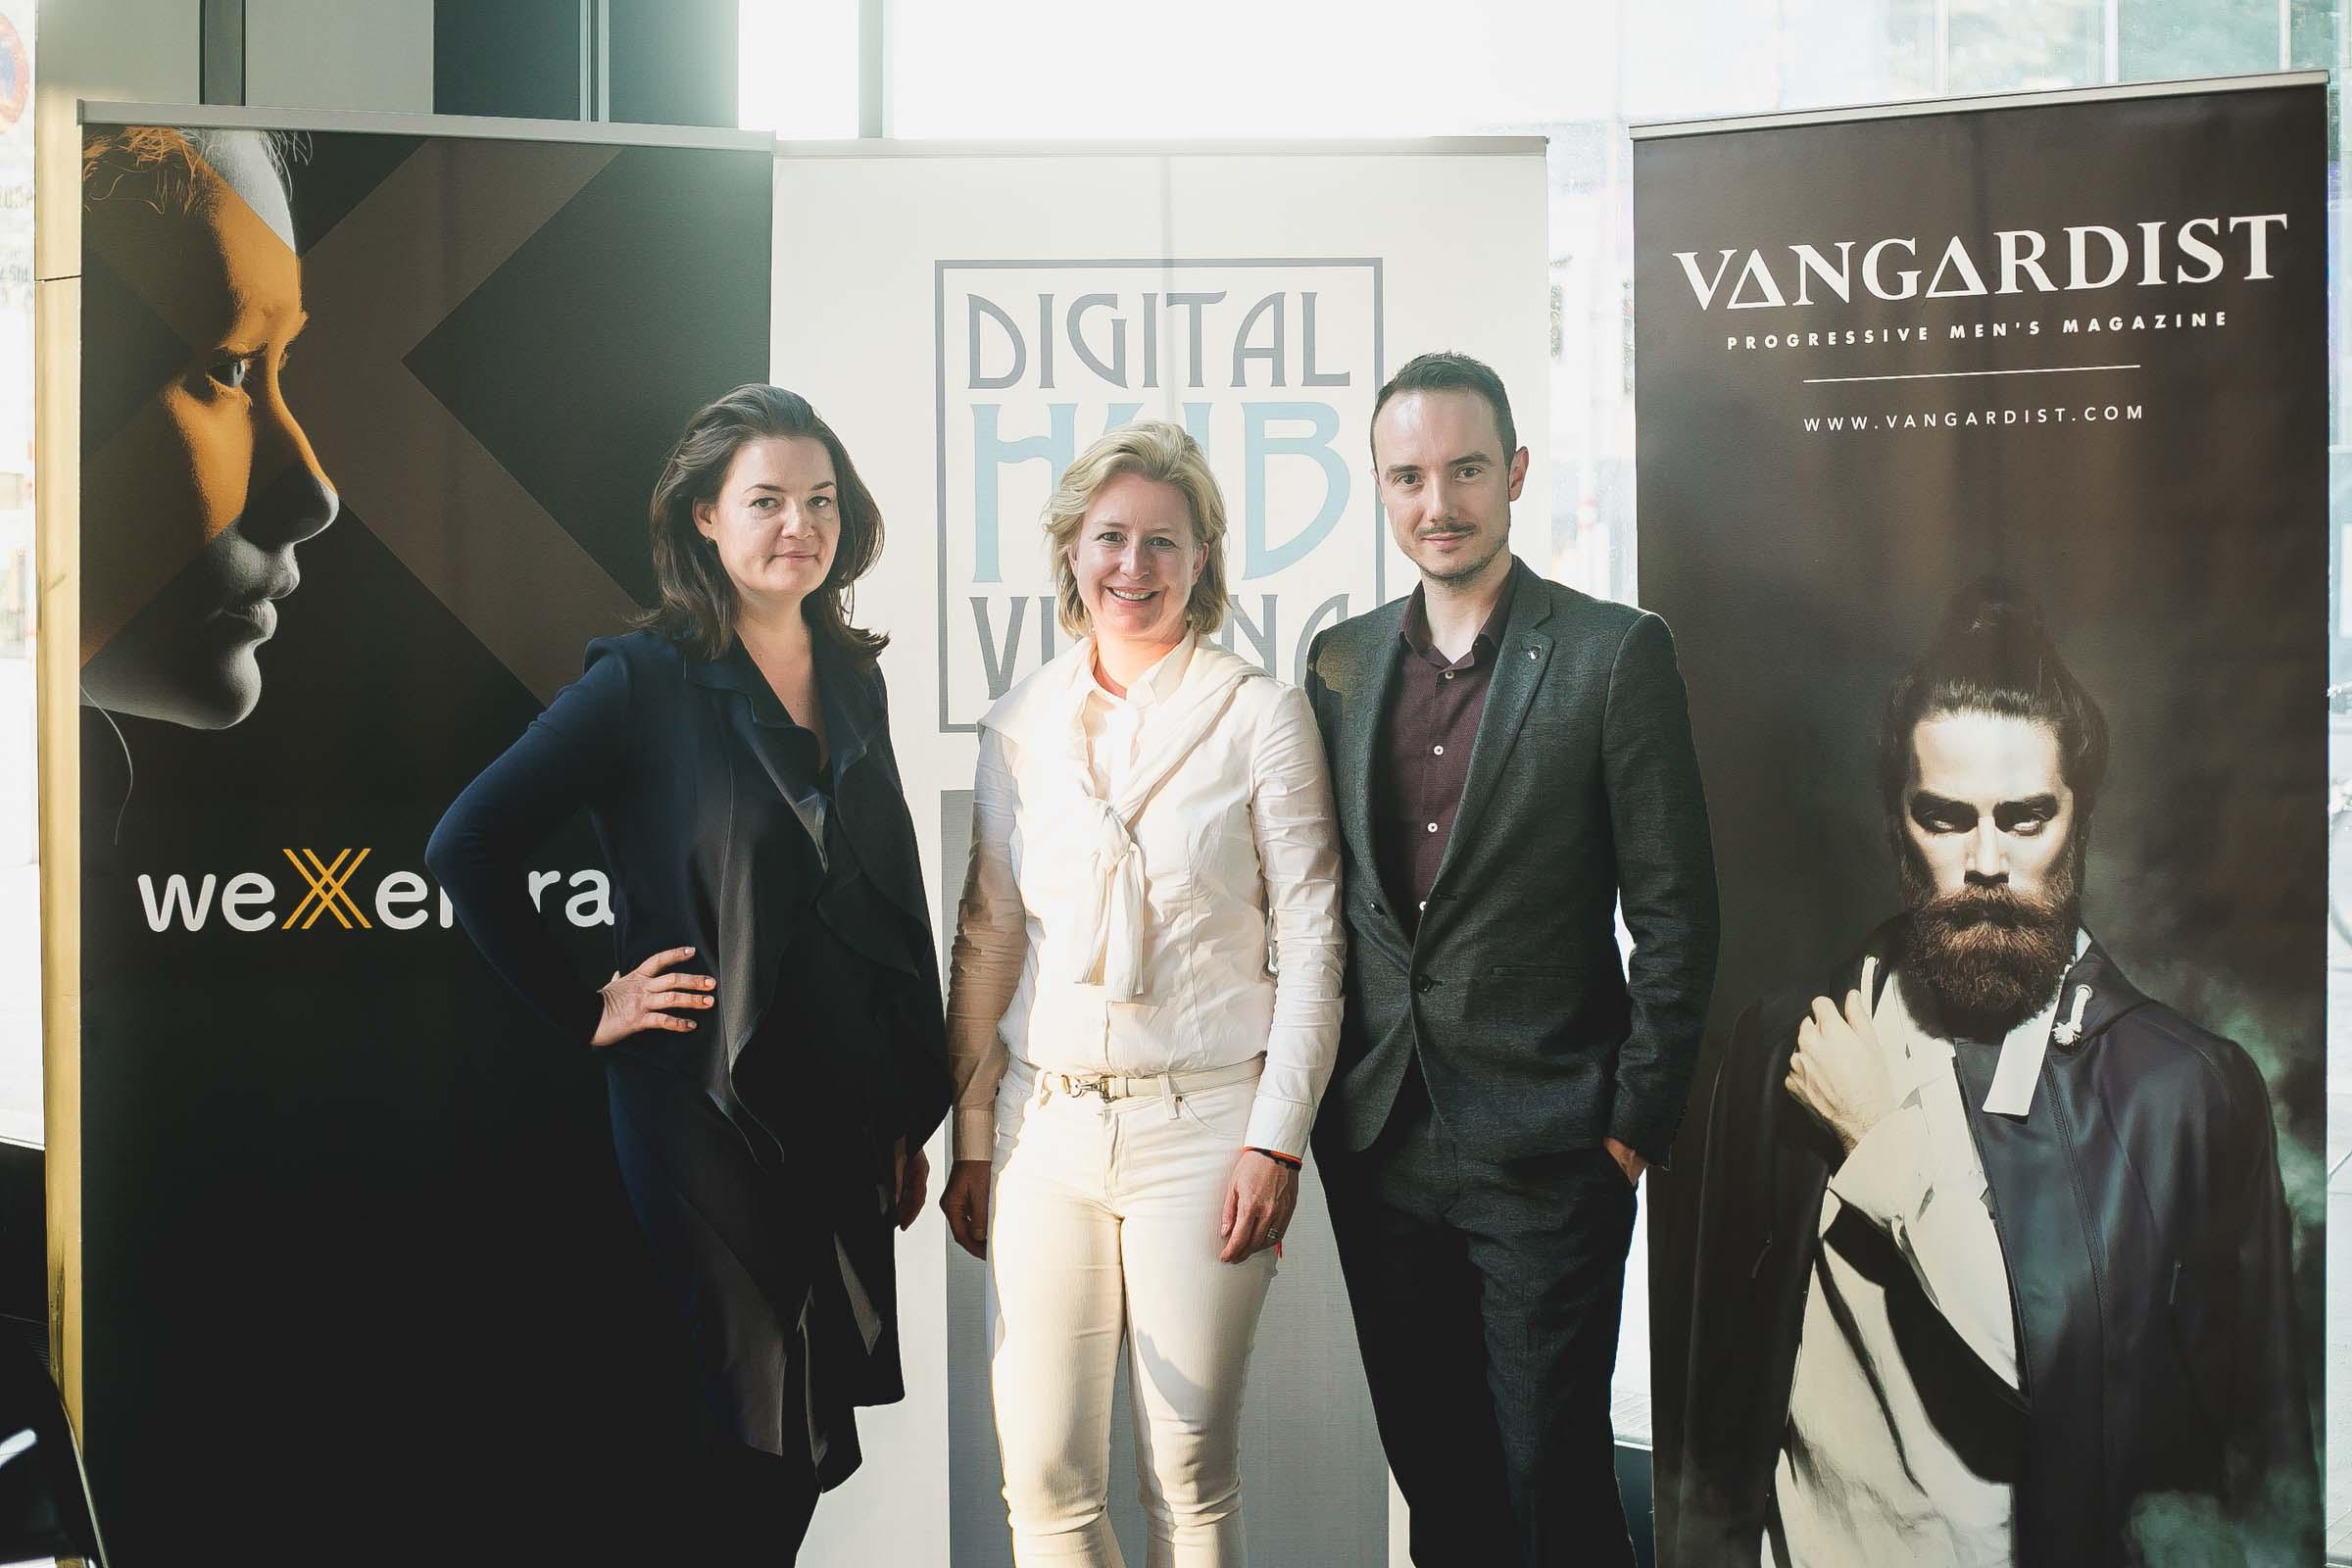 UNTEN Round Table: Eva Weissenberger (Hurrikan), Birgit Kraft-Kinz (Digital Hub Vienna/KRAFTKINZ), Julian Wiehl (Vangardist Magazin). Copyright: Digital Hub Vienna/Zytka